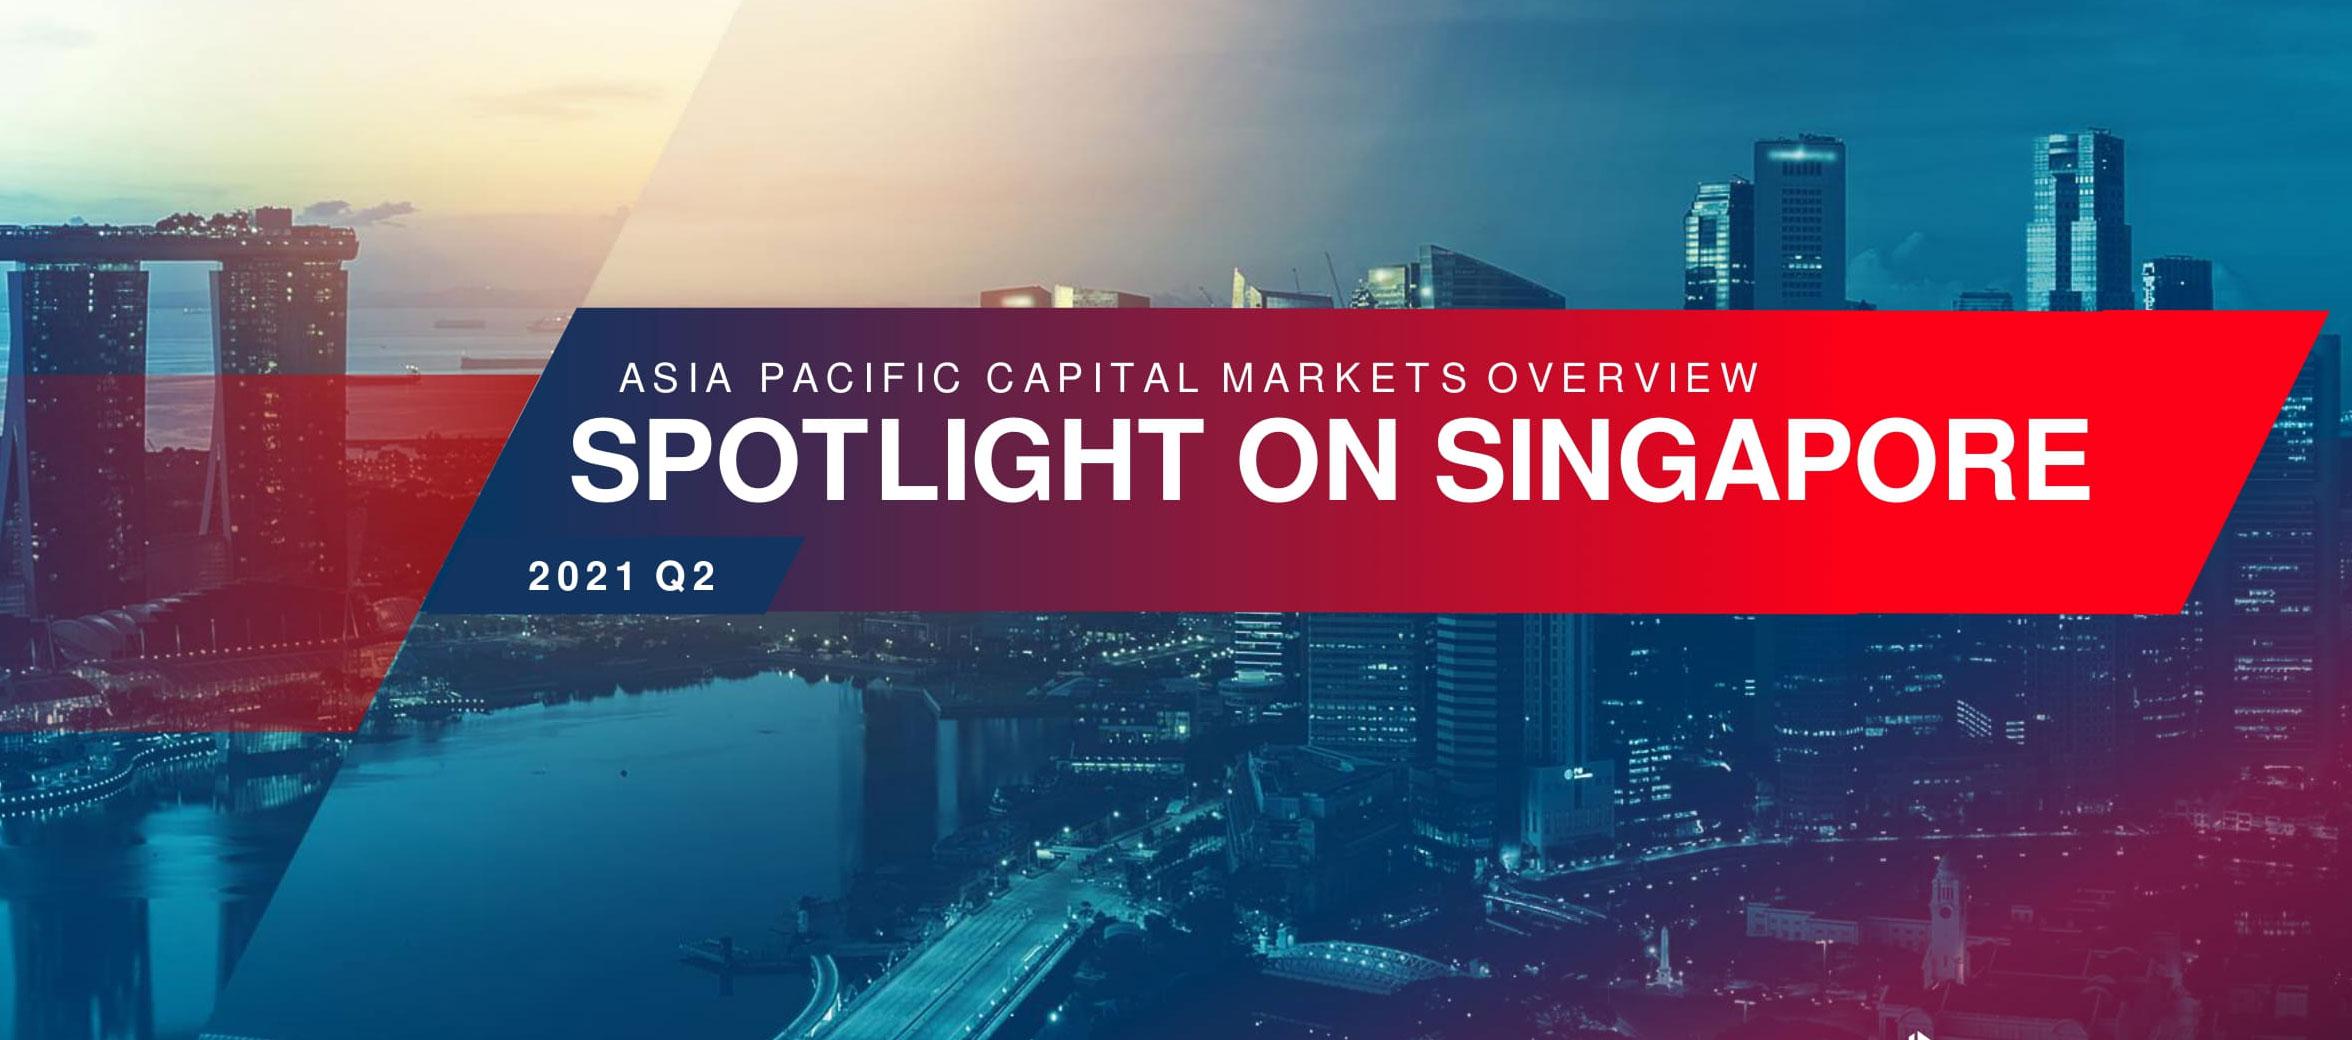 Video-Capital-Markets-Spotlight-on-Singapore-desktop